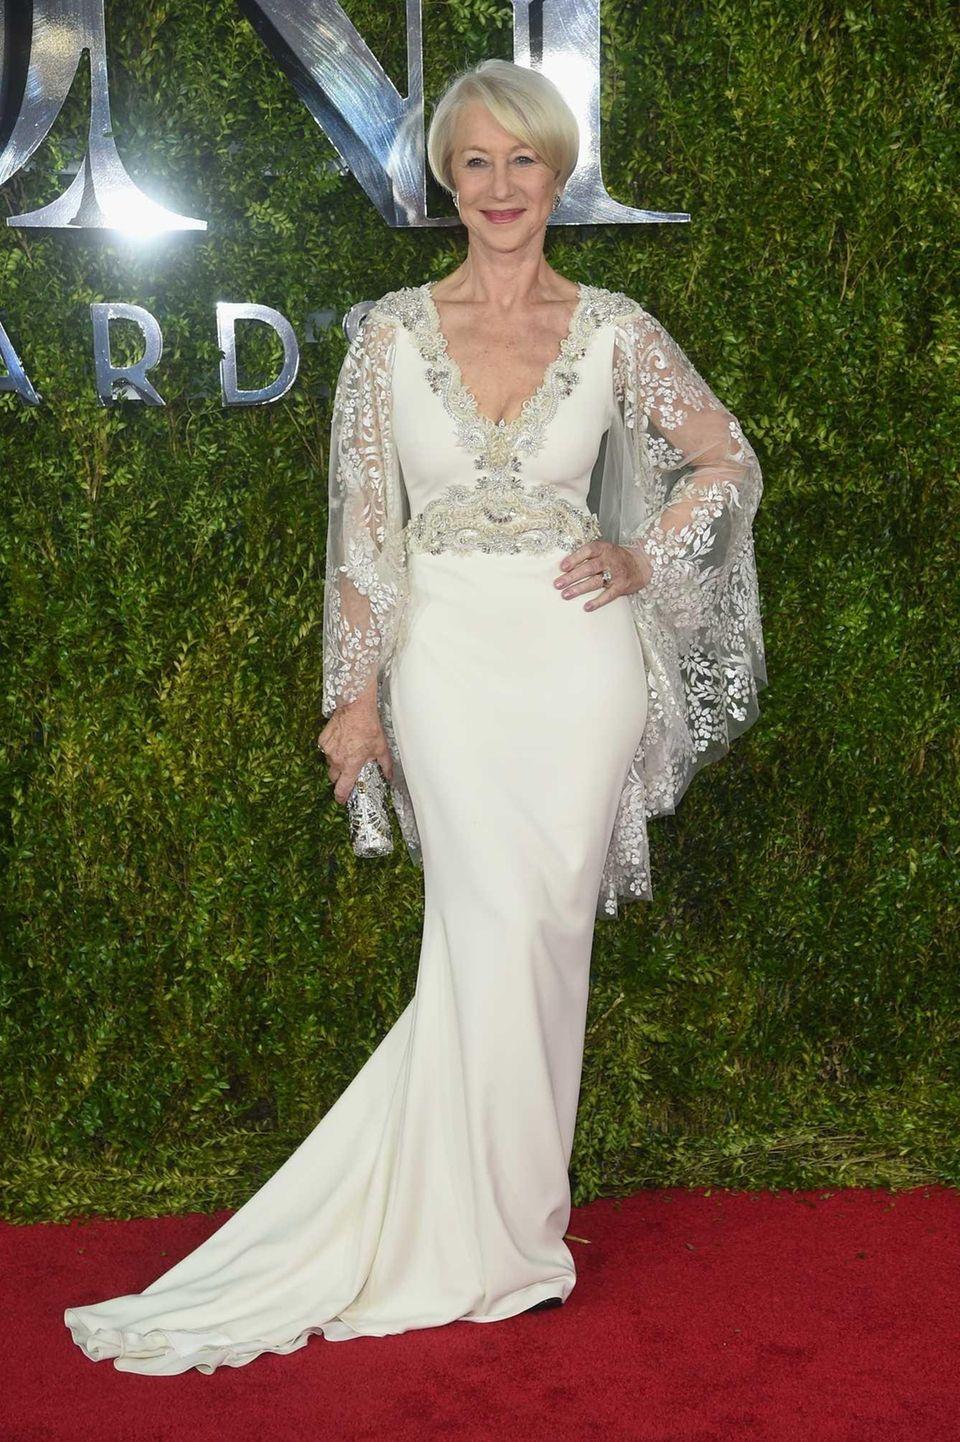 Helen Mirren attends the 2015 Tony Awards at